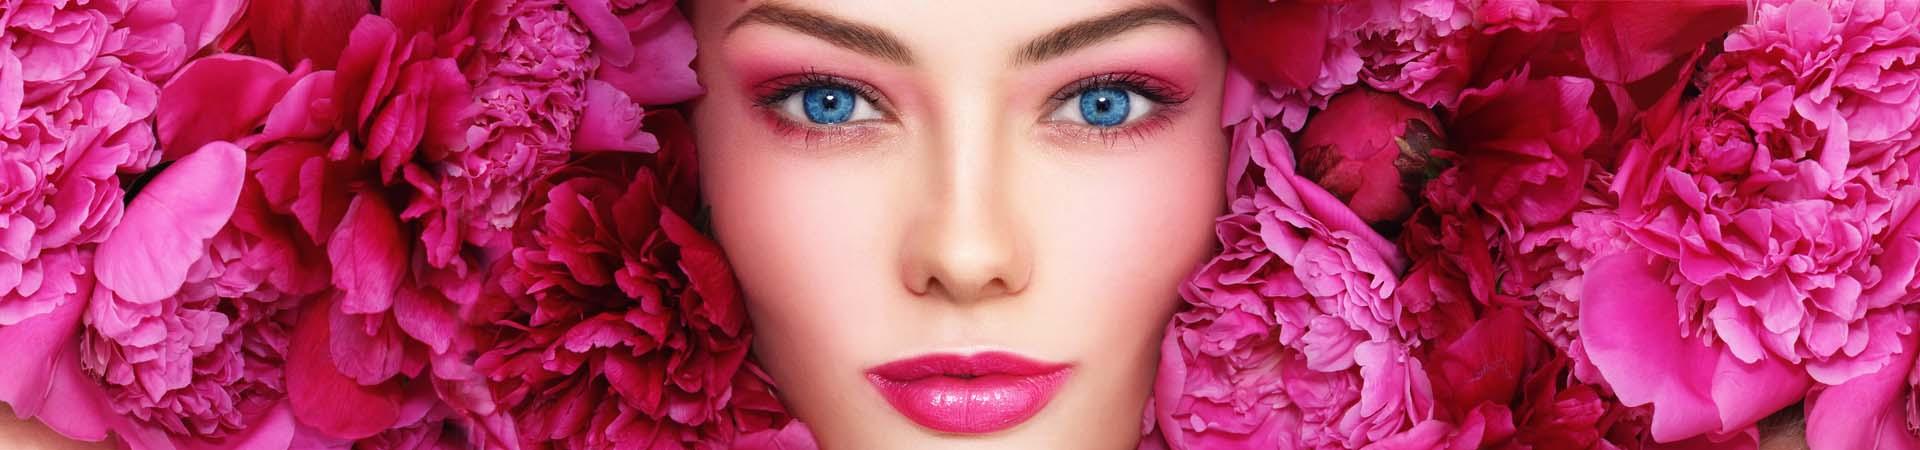 Face Aromatherapy